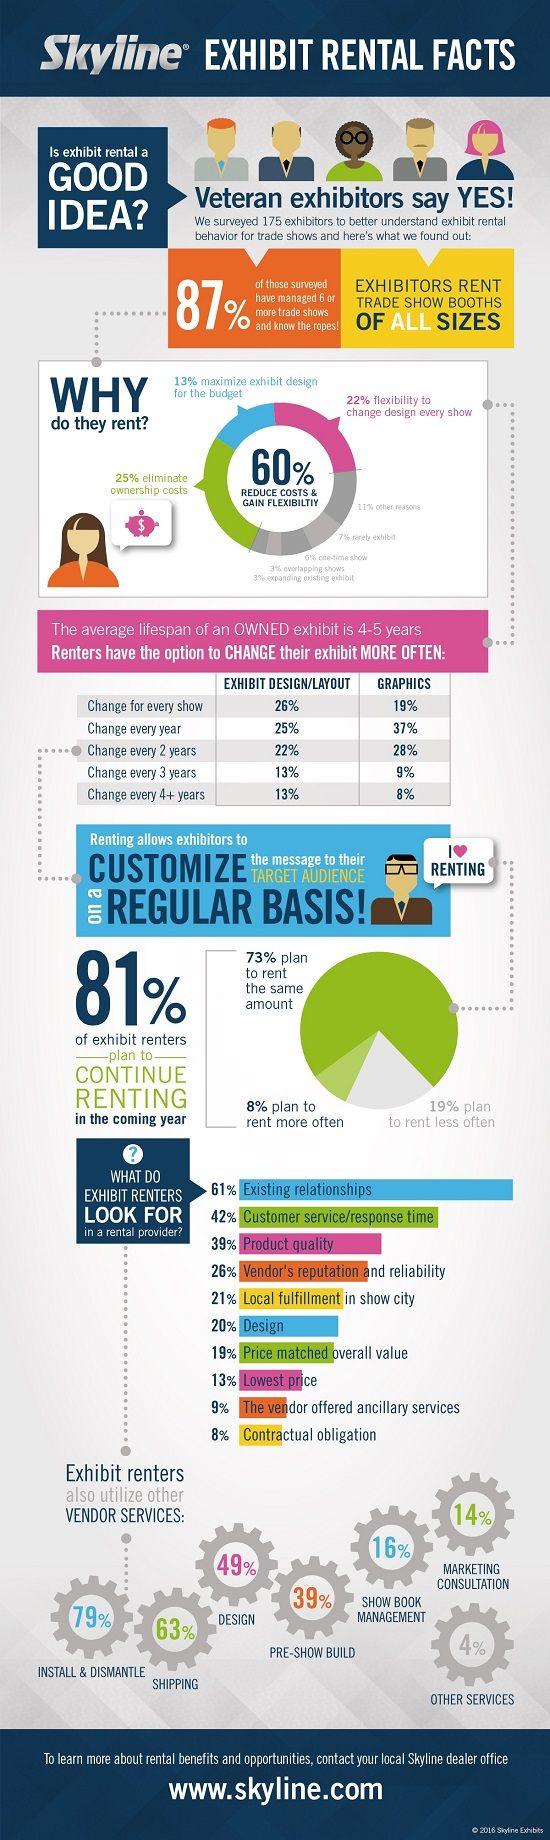 Exhibit Rental Facts #infographic